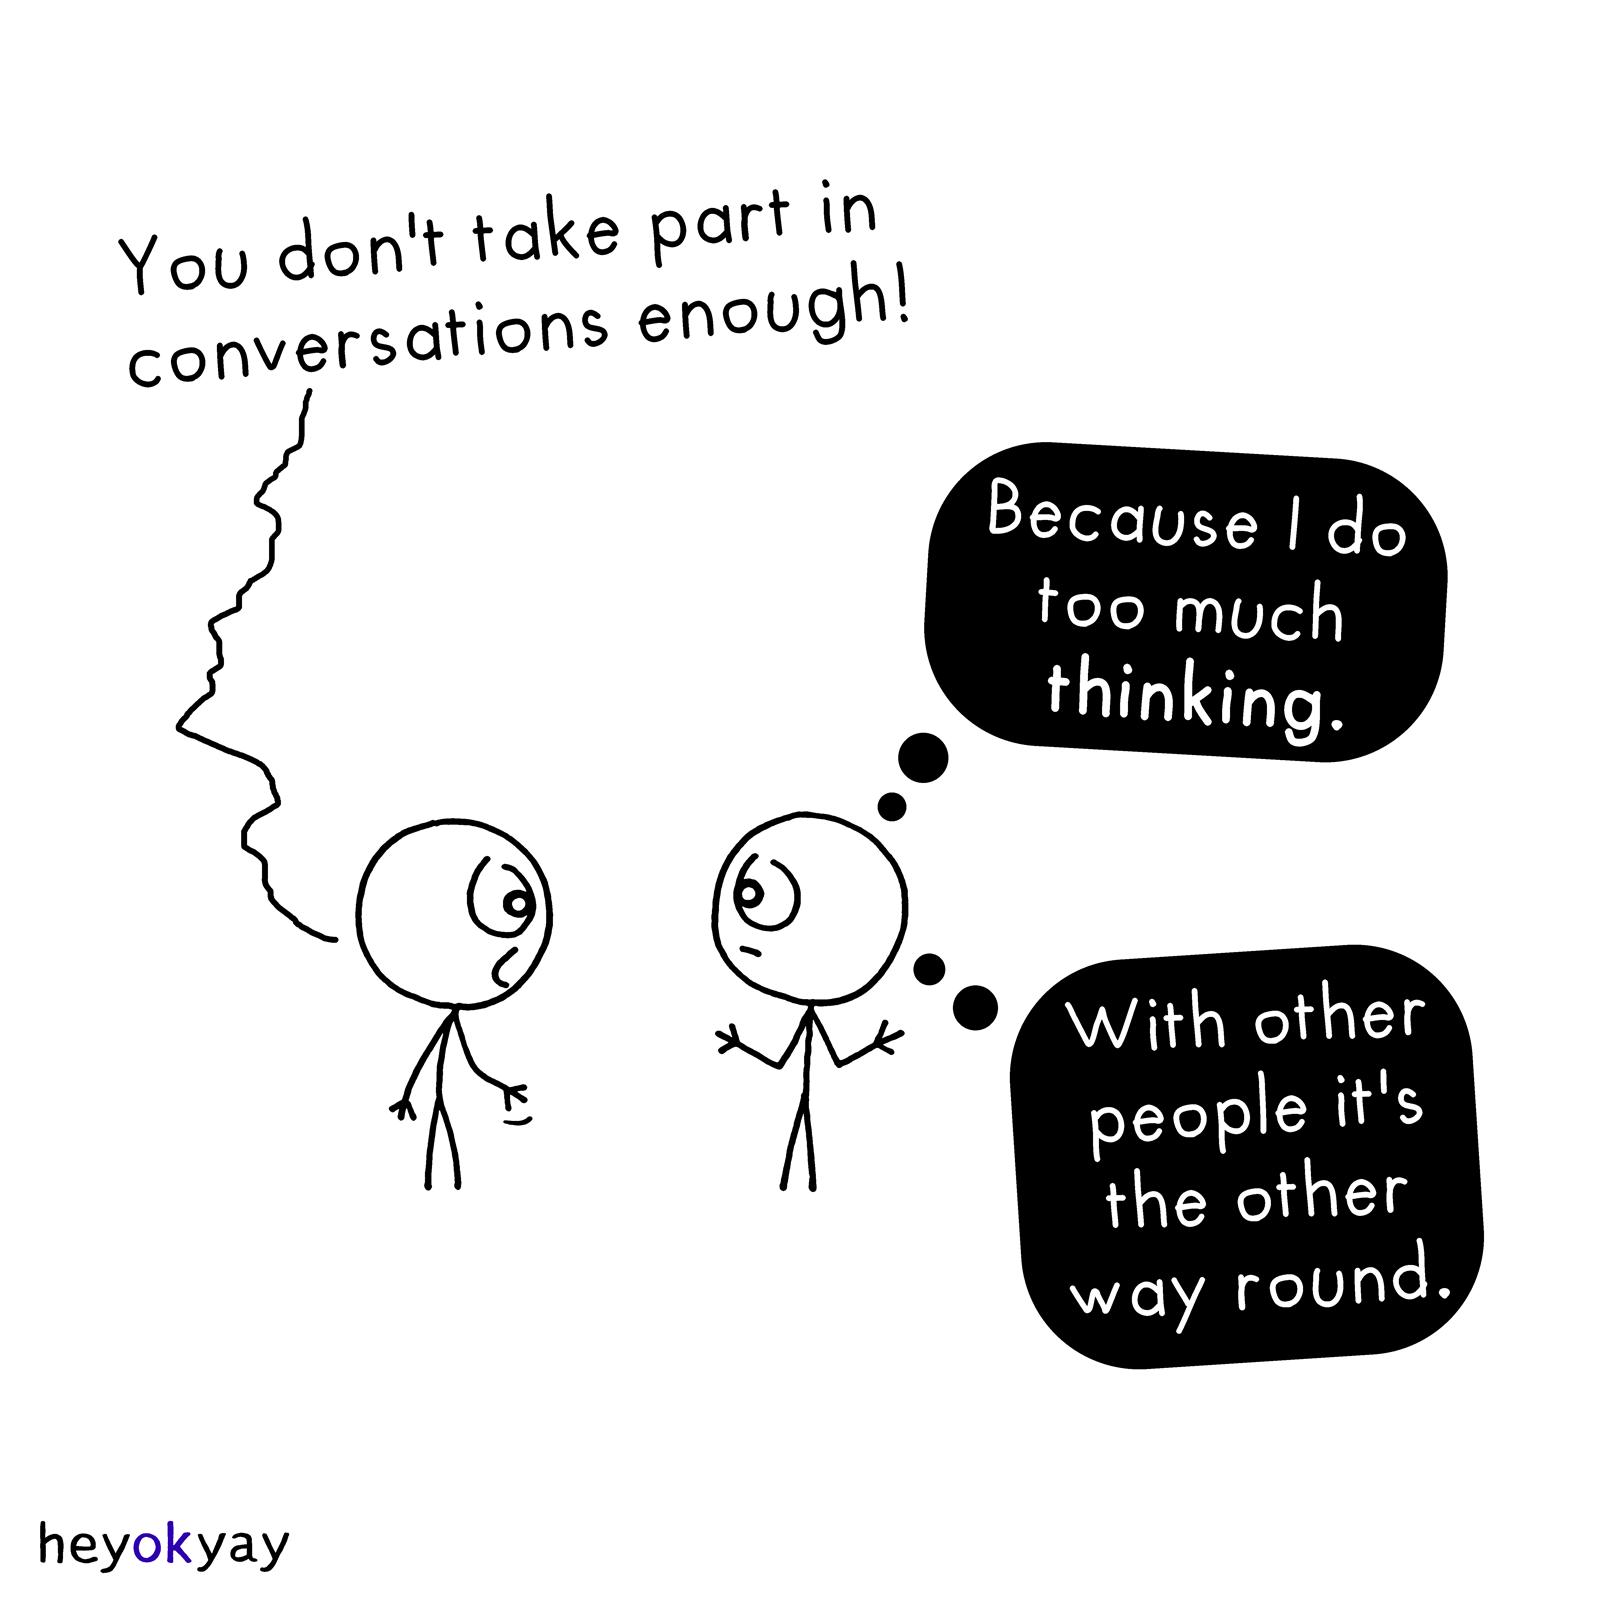 Conversations heyokyay comic